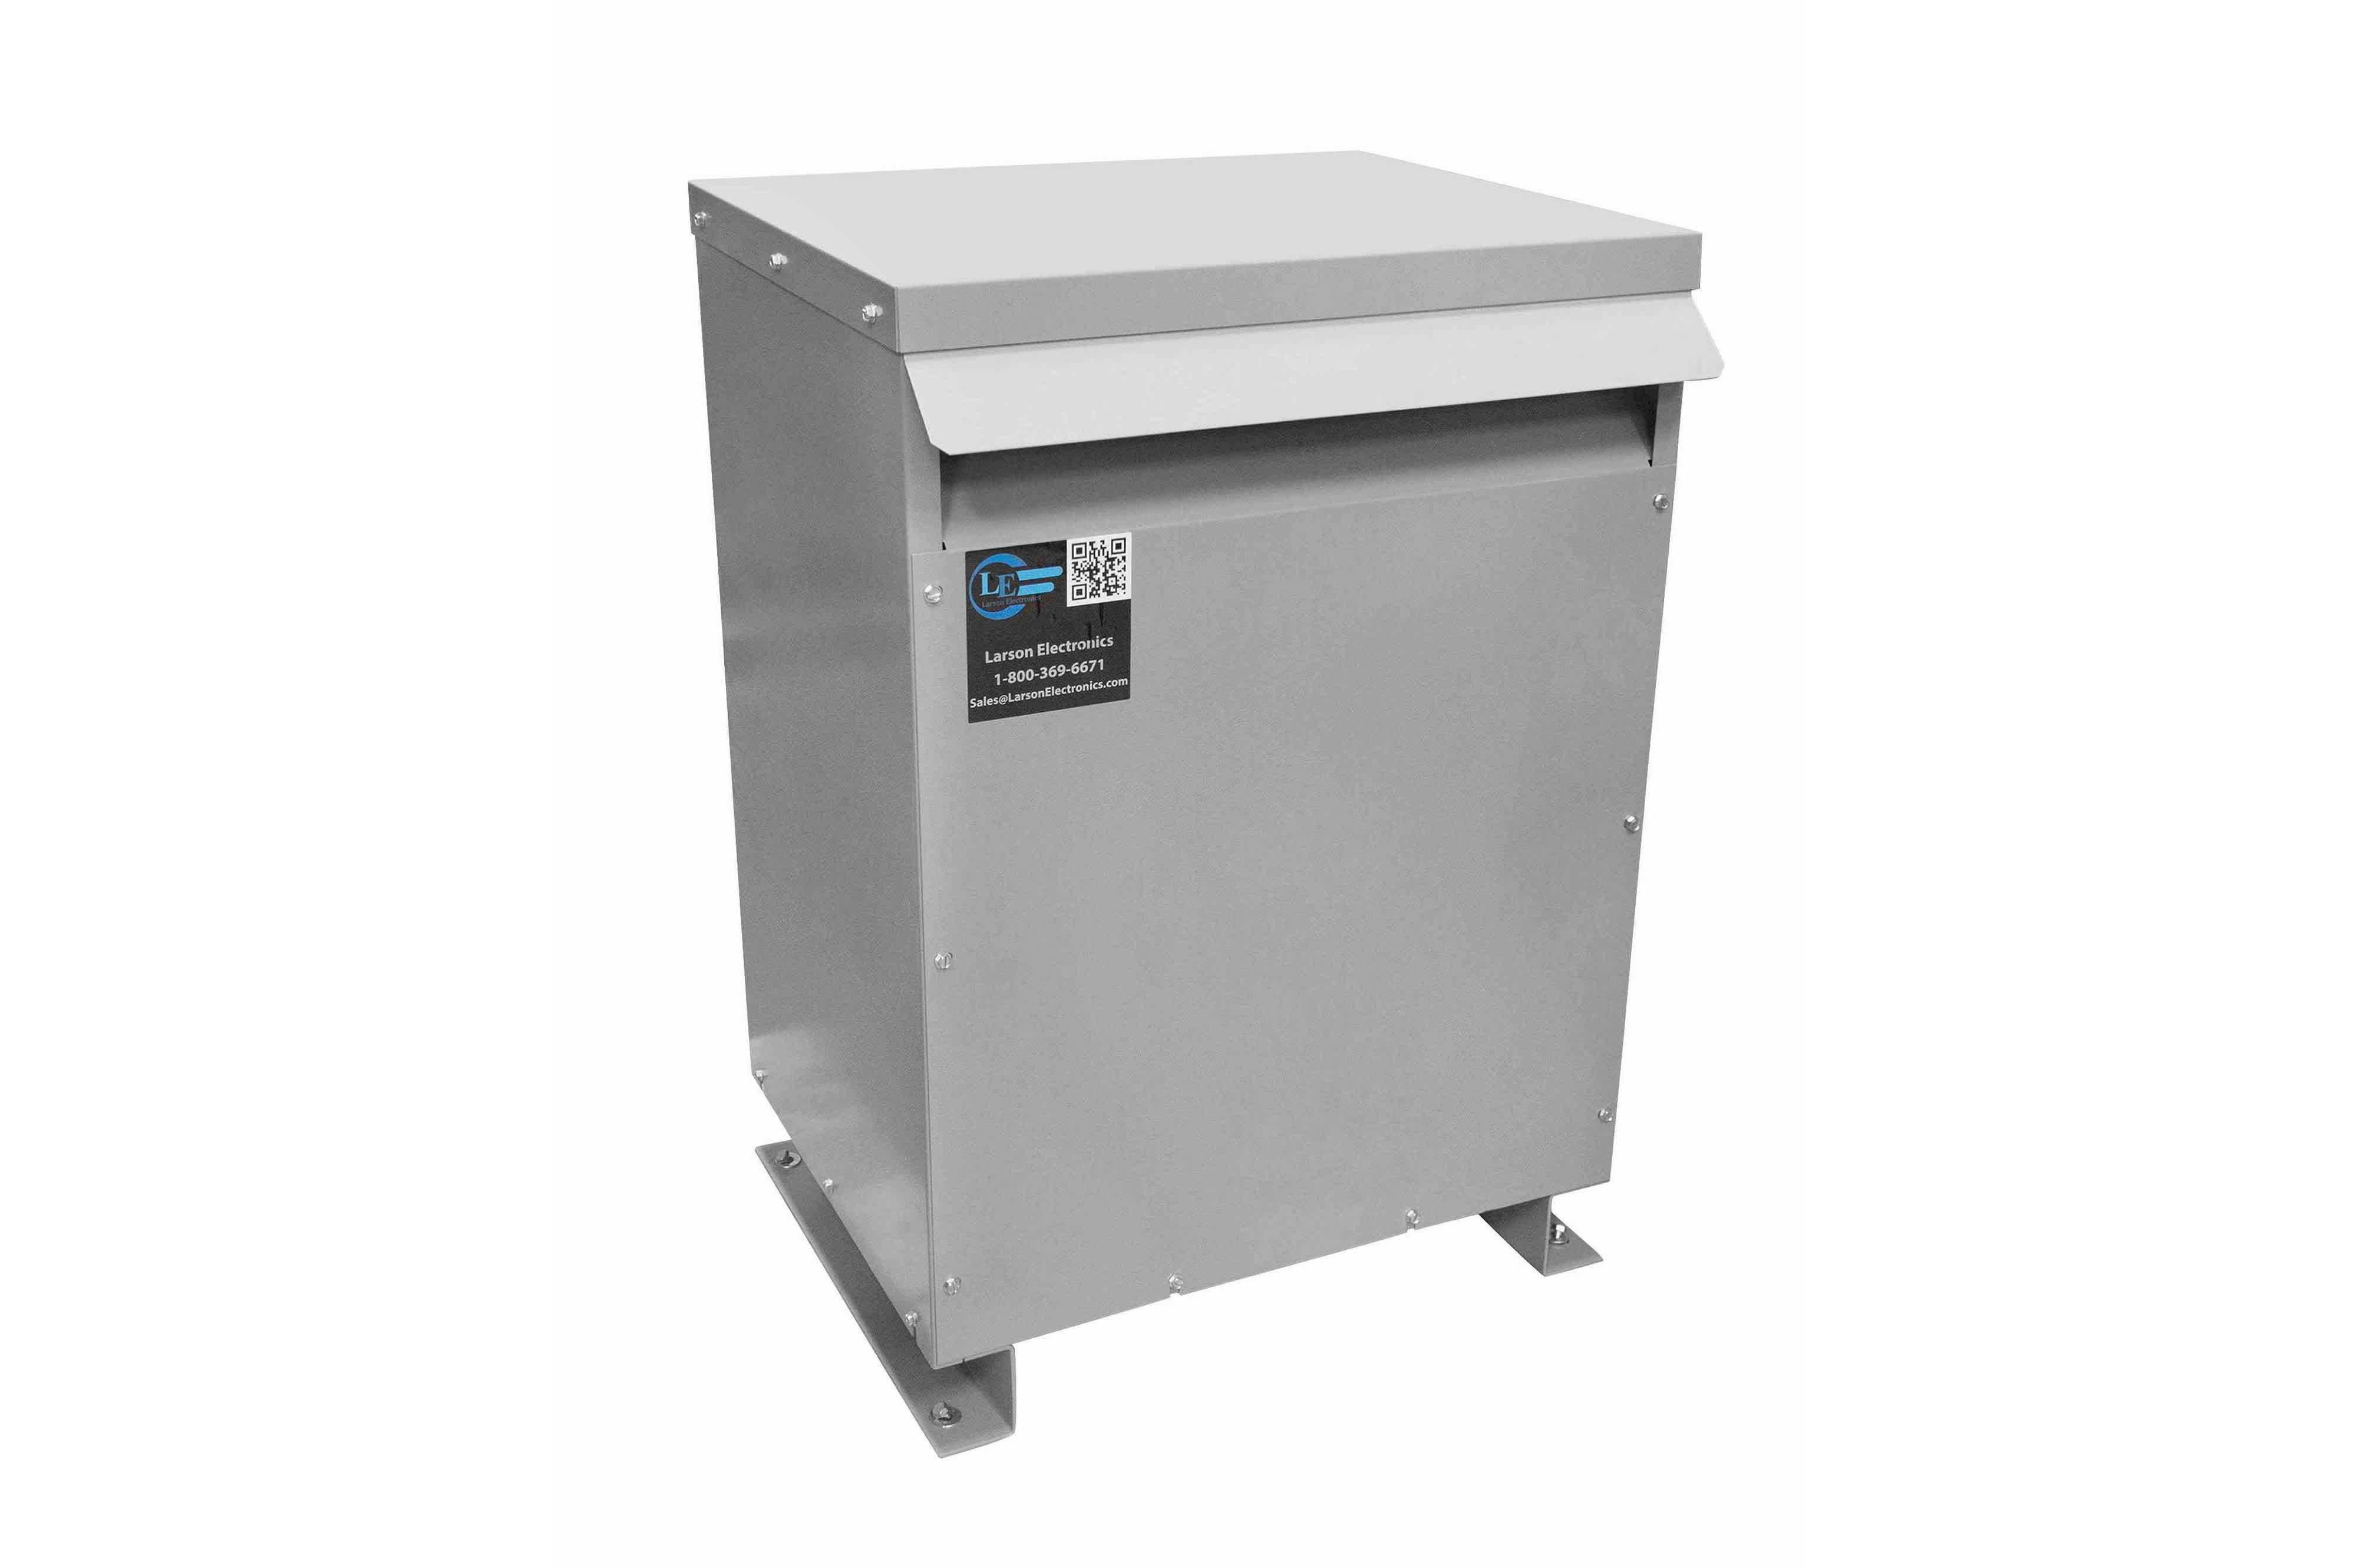 52.5 kVA 3PH Isolation Transformer, 480V Wye Primary, 415V Delta Secondary, N3R, Ventilated, 60 Hz